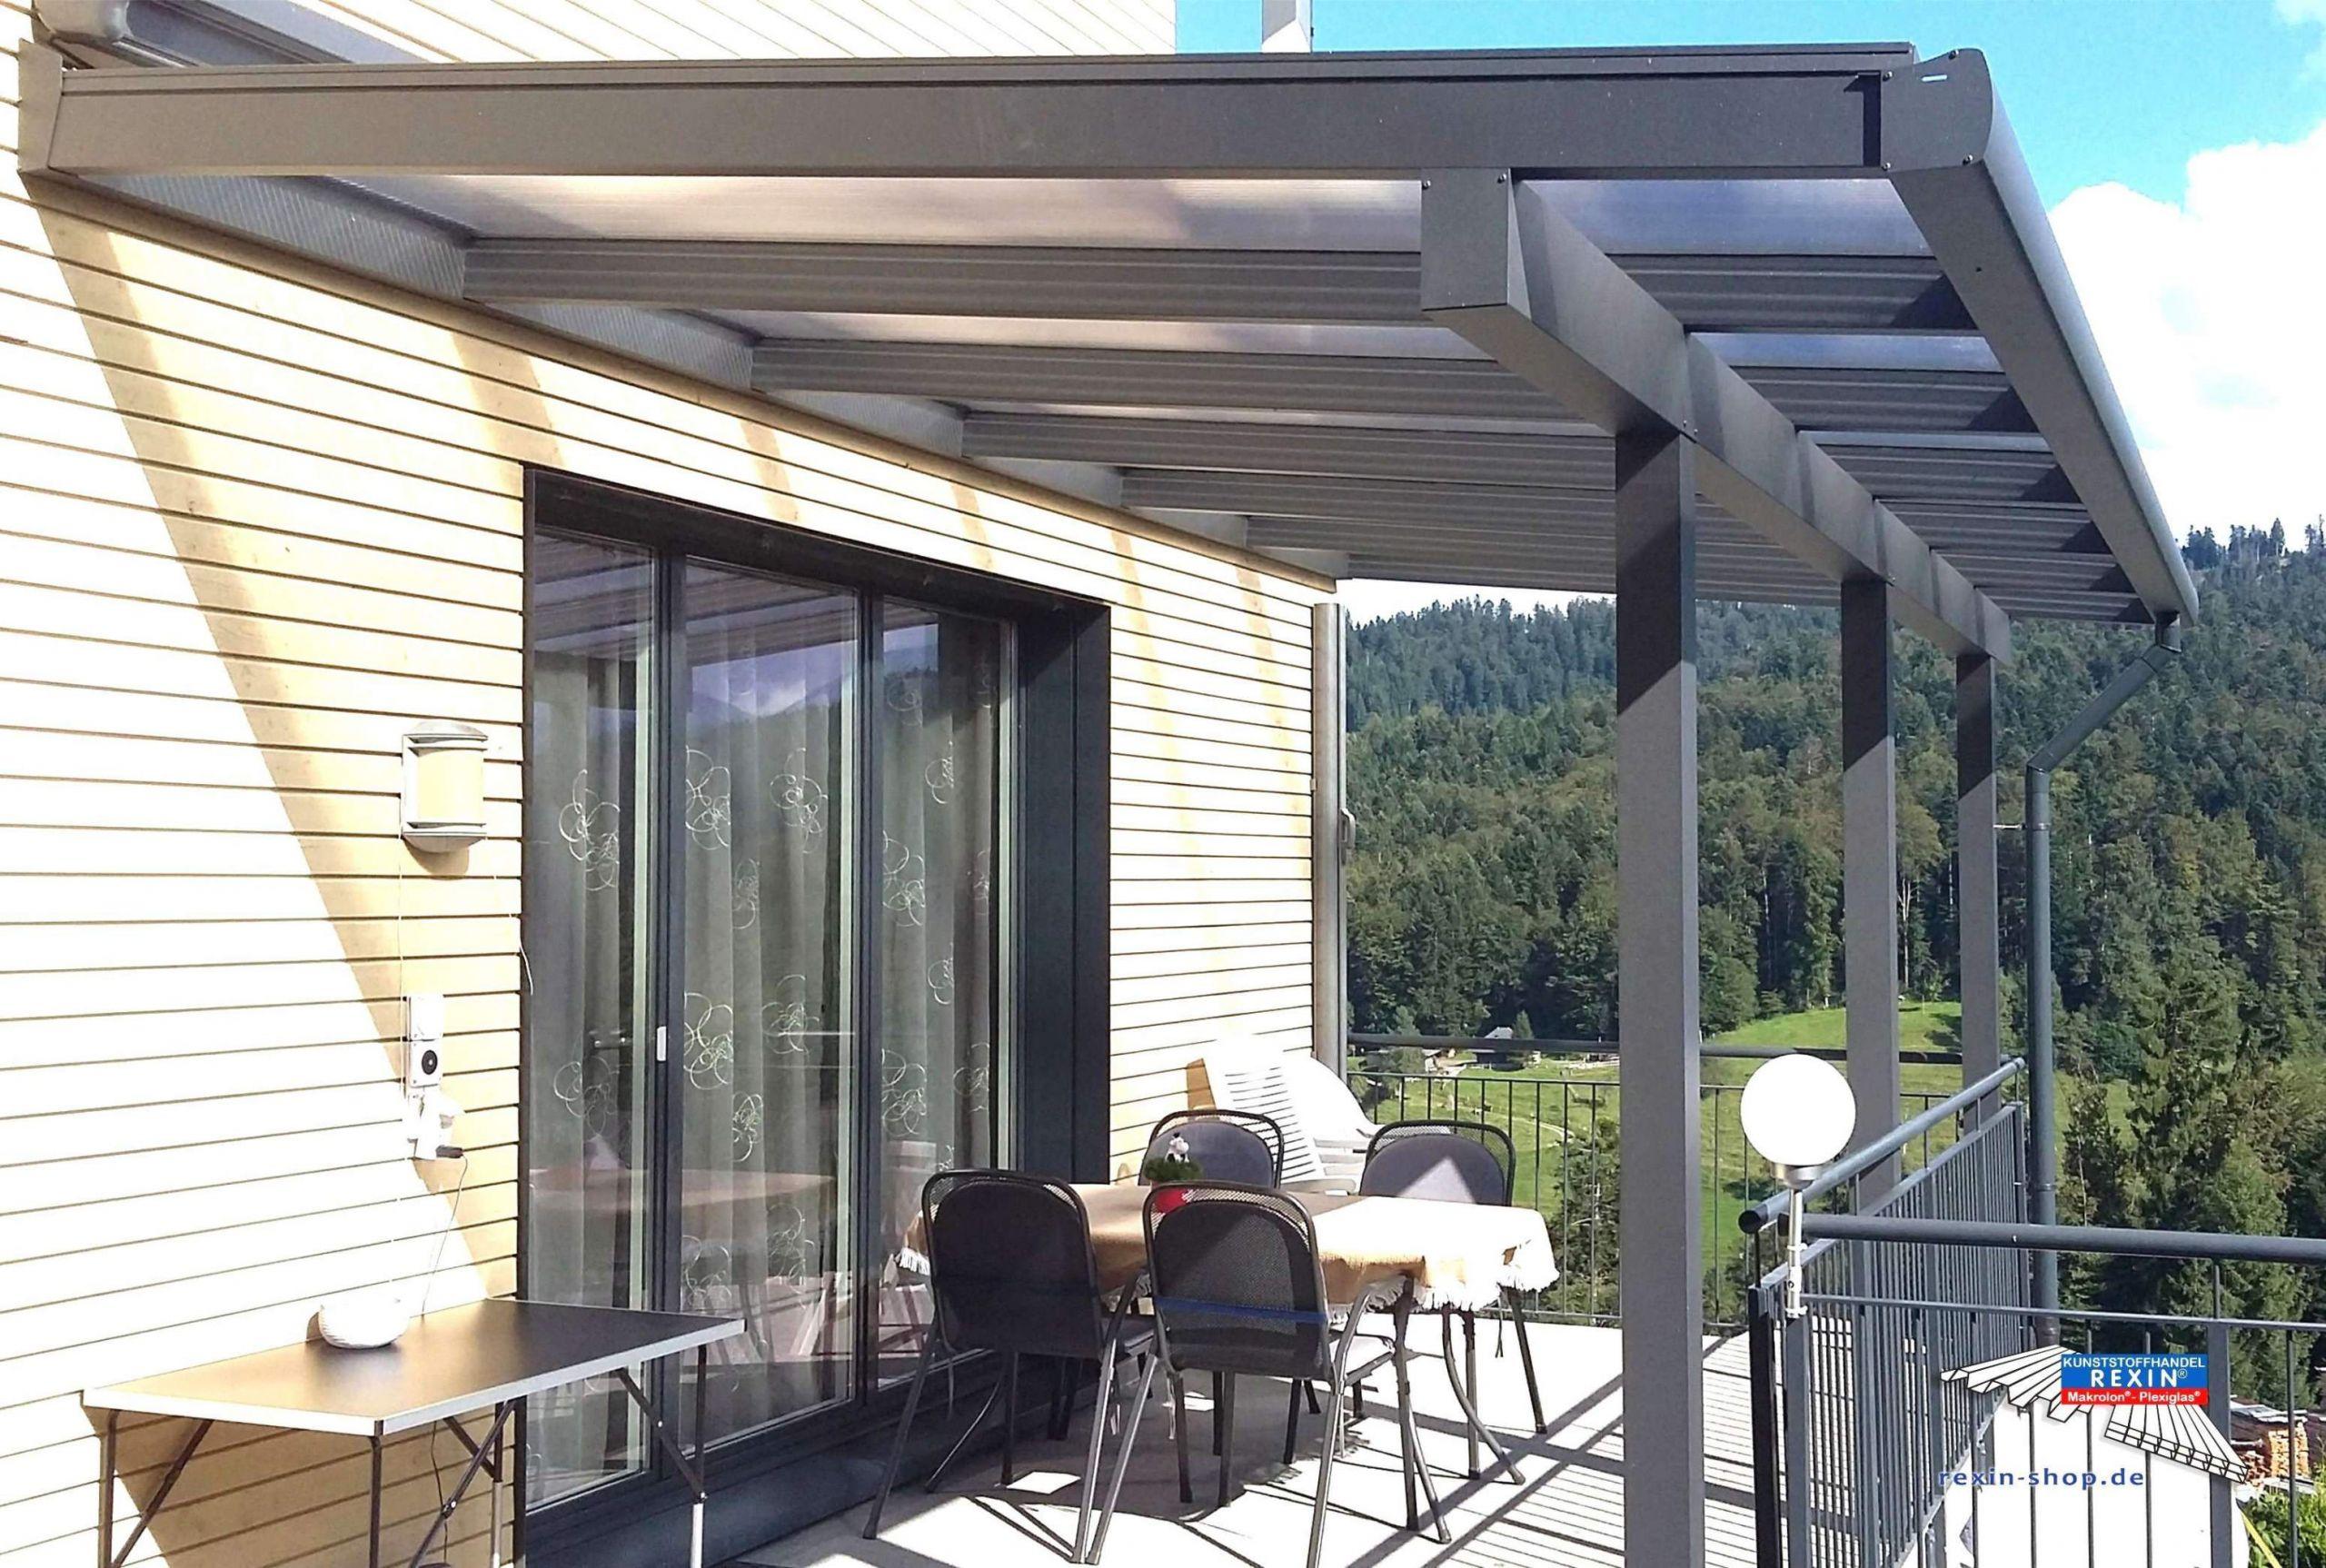 garten terrasse ideen einzigartig moderne terrassen ideen temobardz home blog of garten terrasse ideen 1 scaled